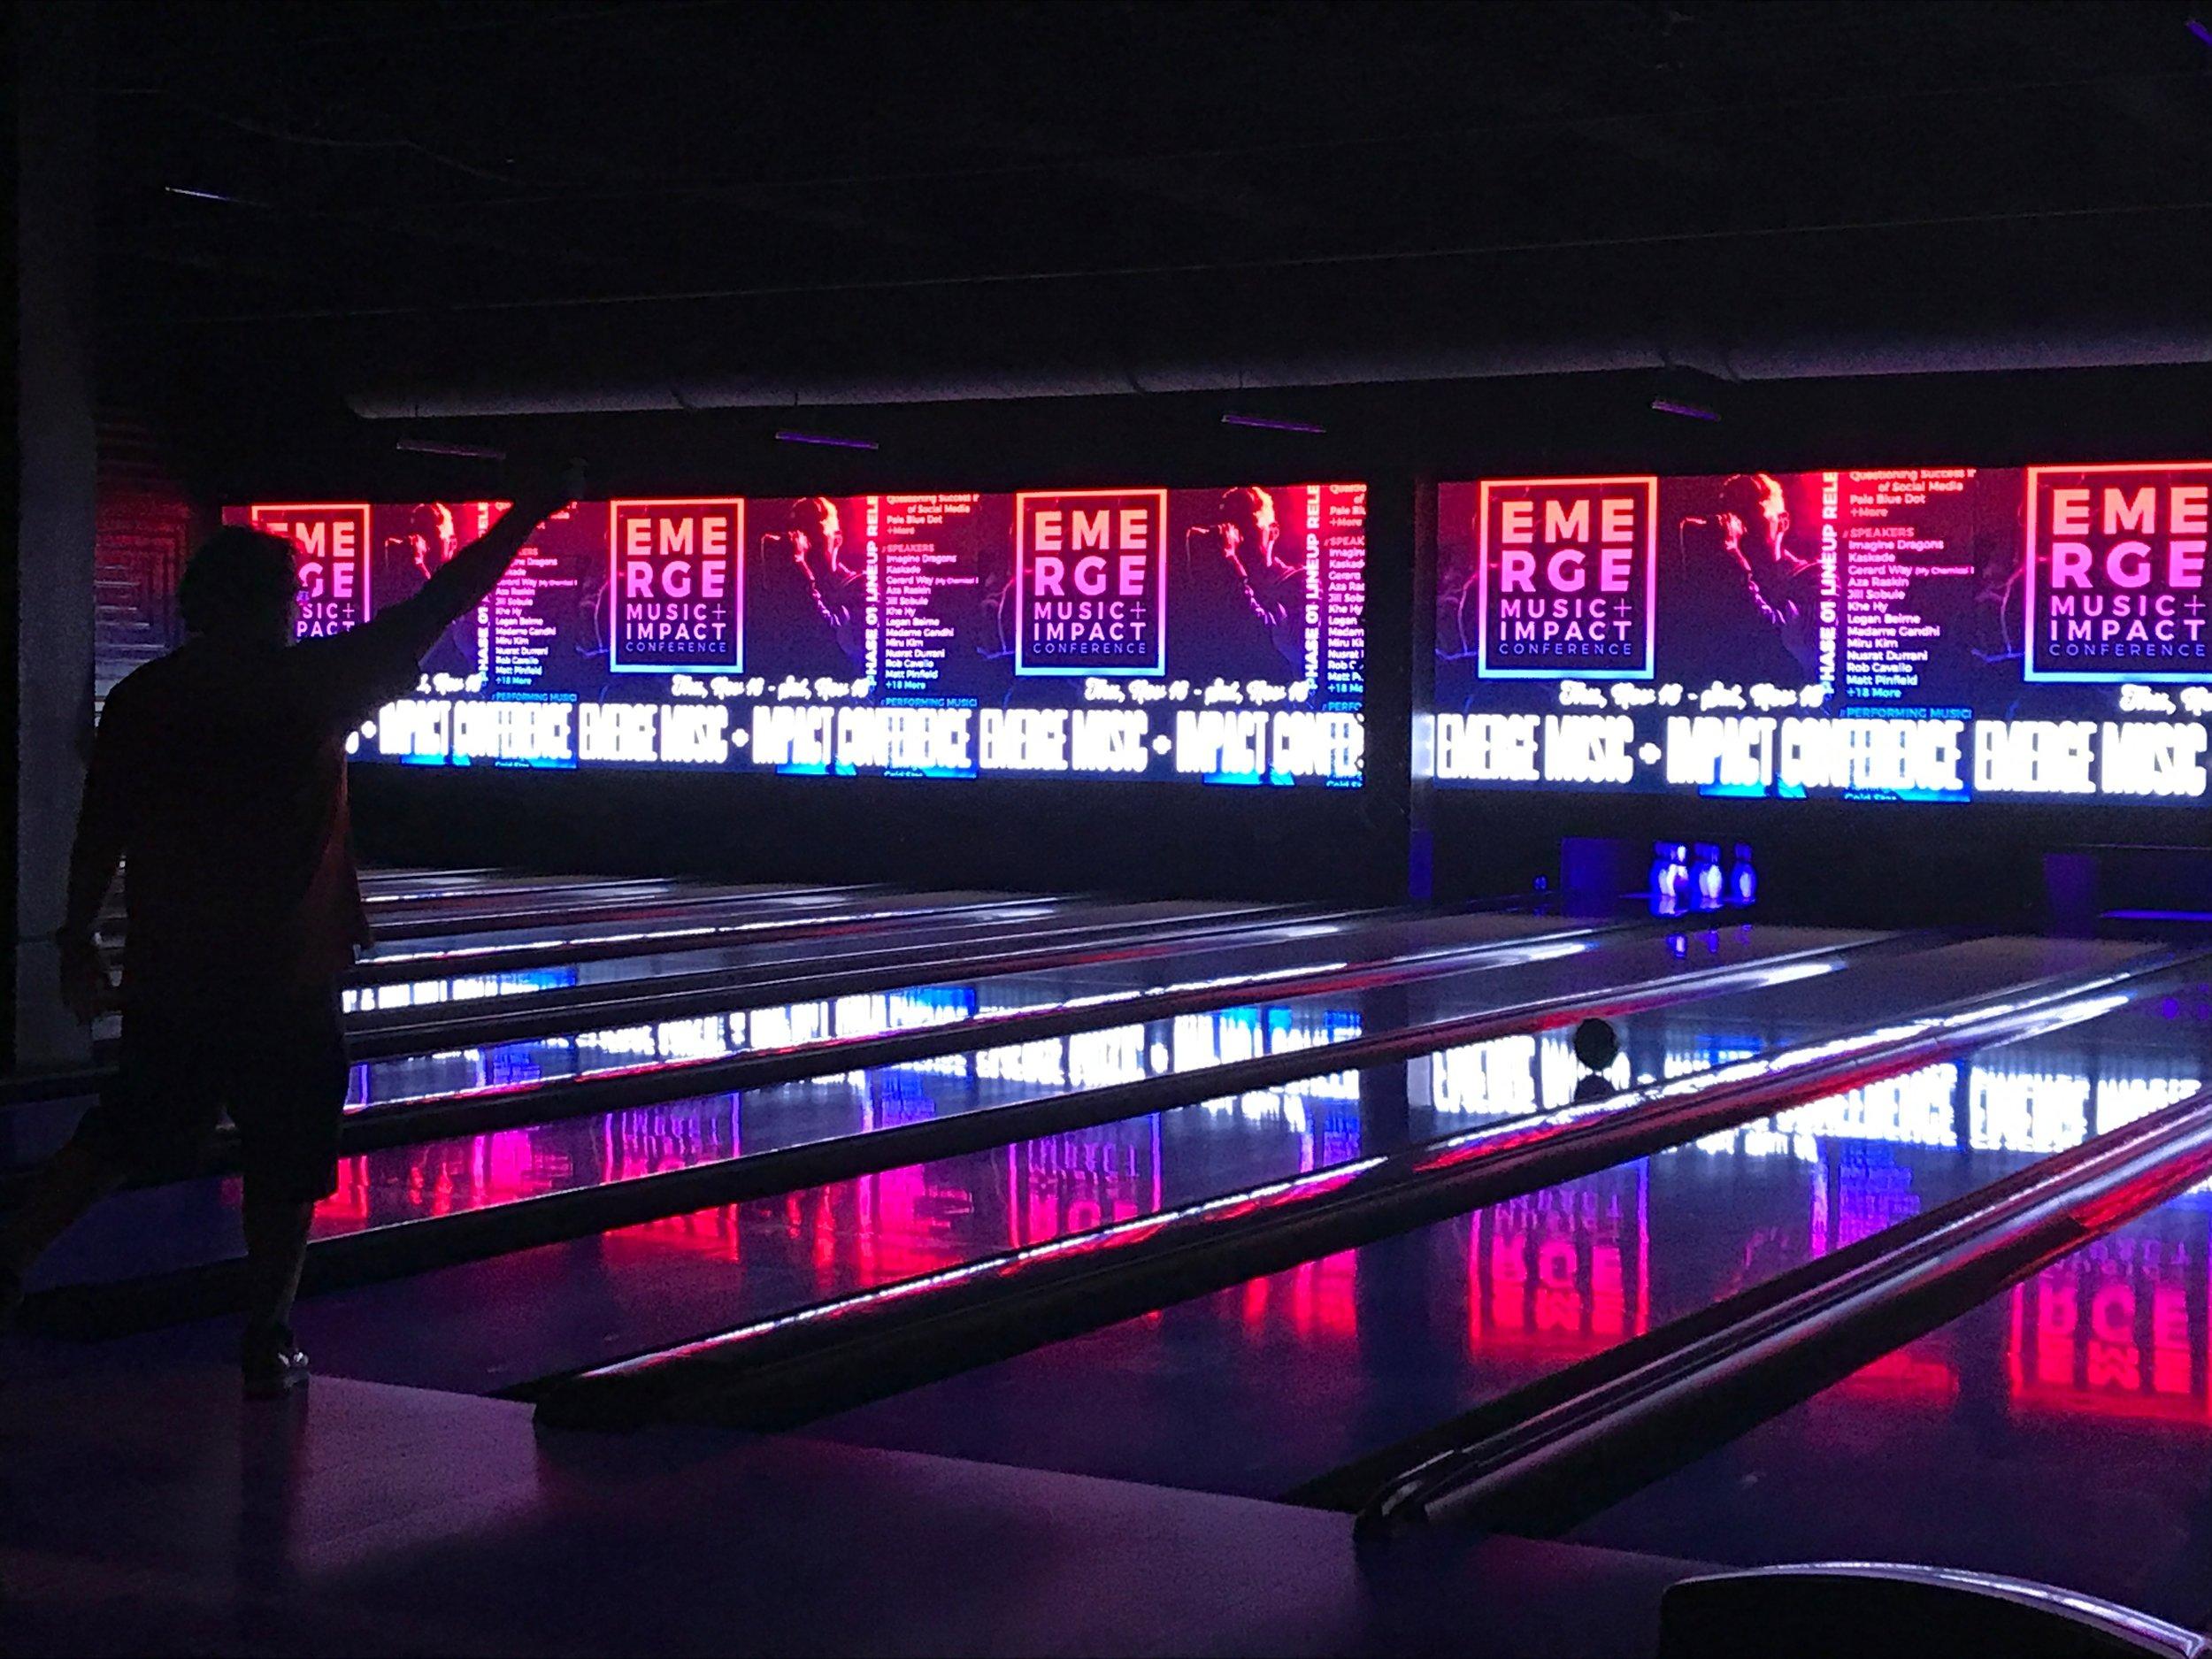 emerge bowling lanes.JPG